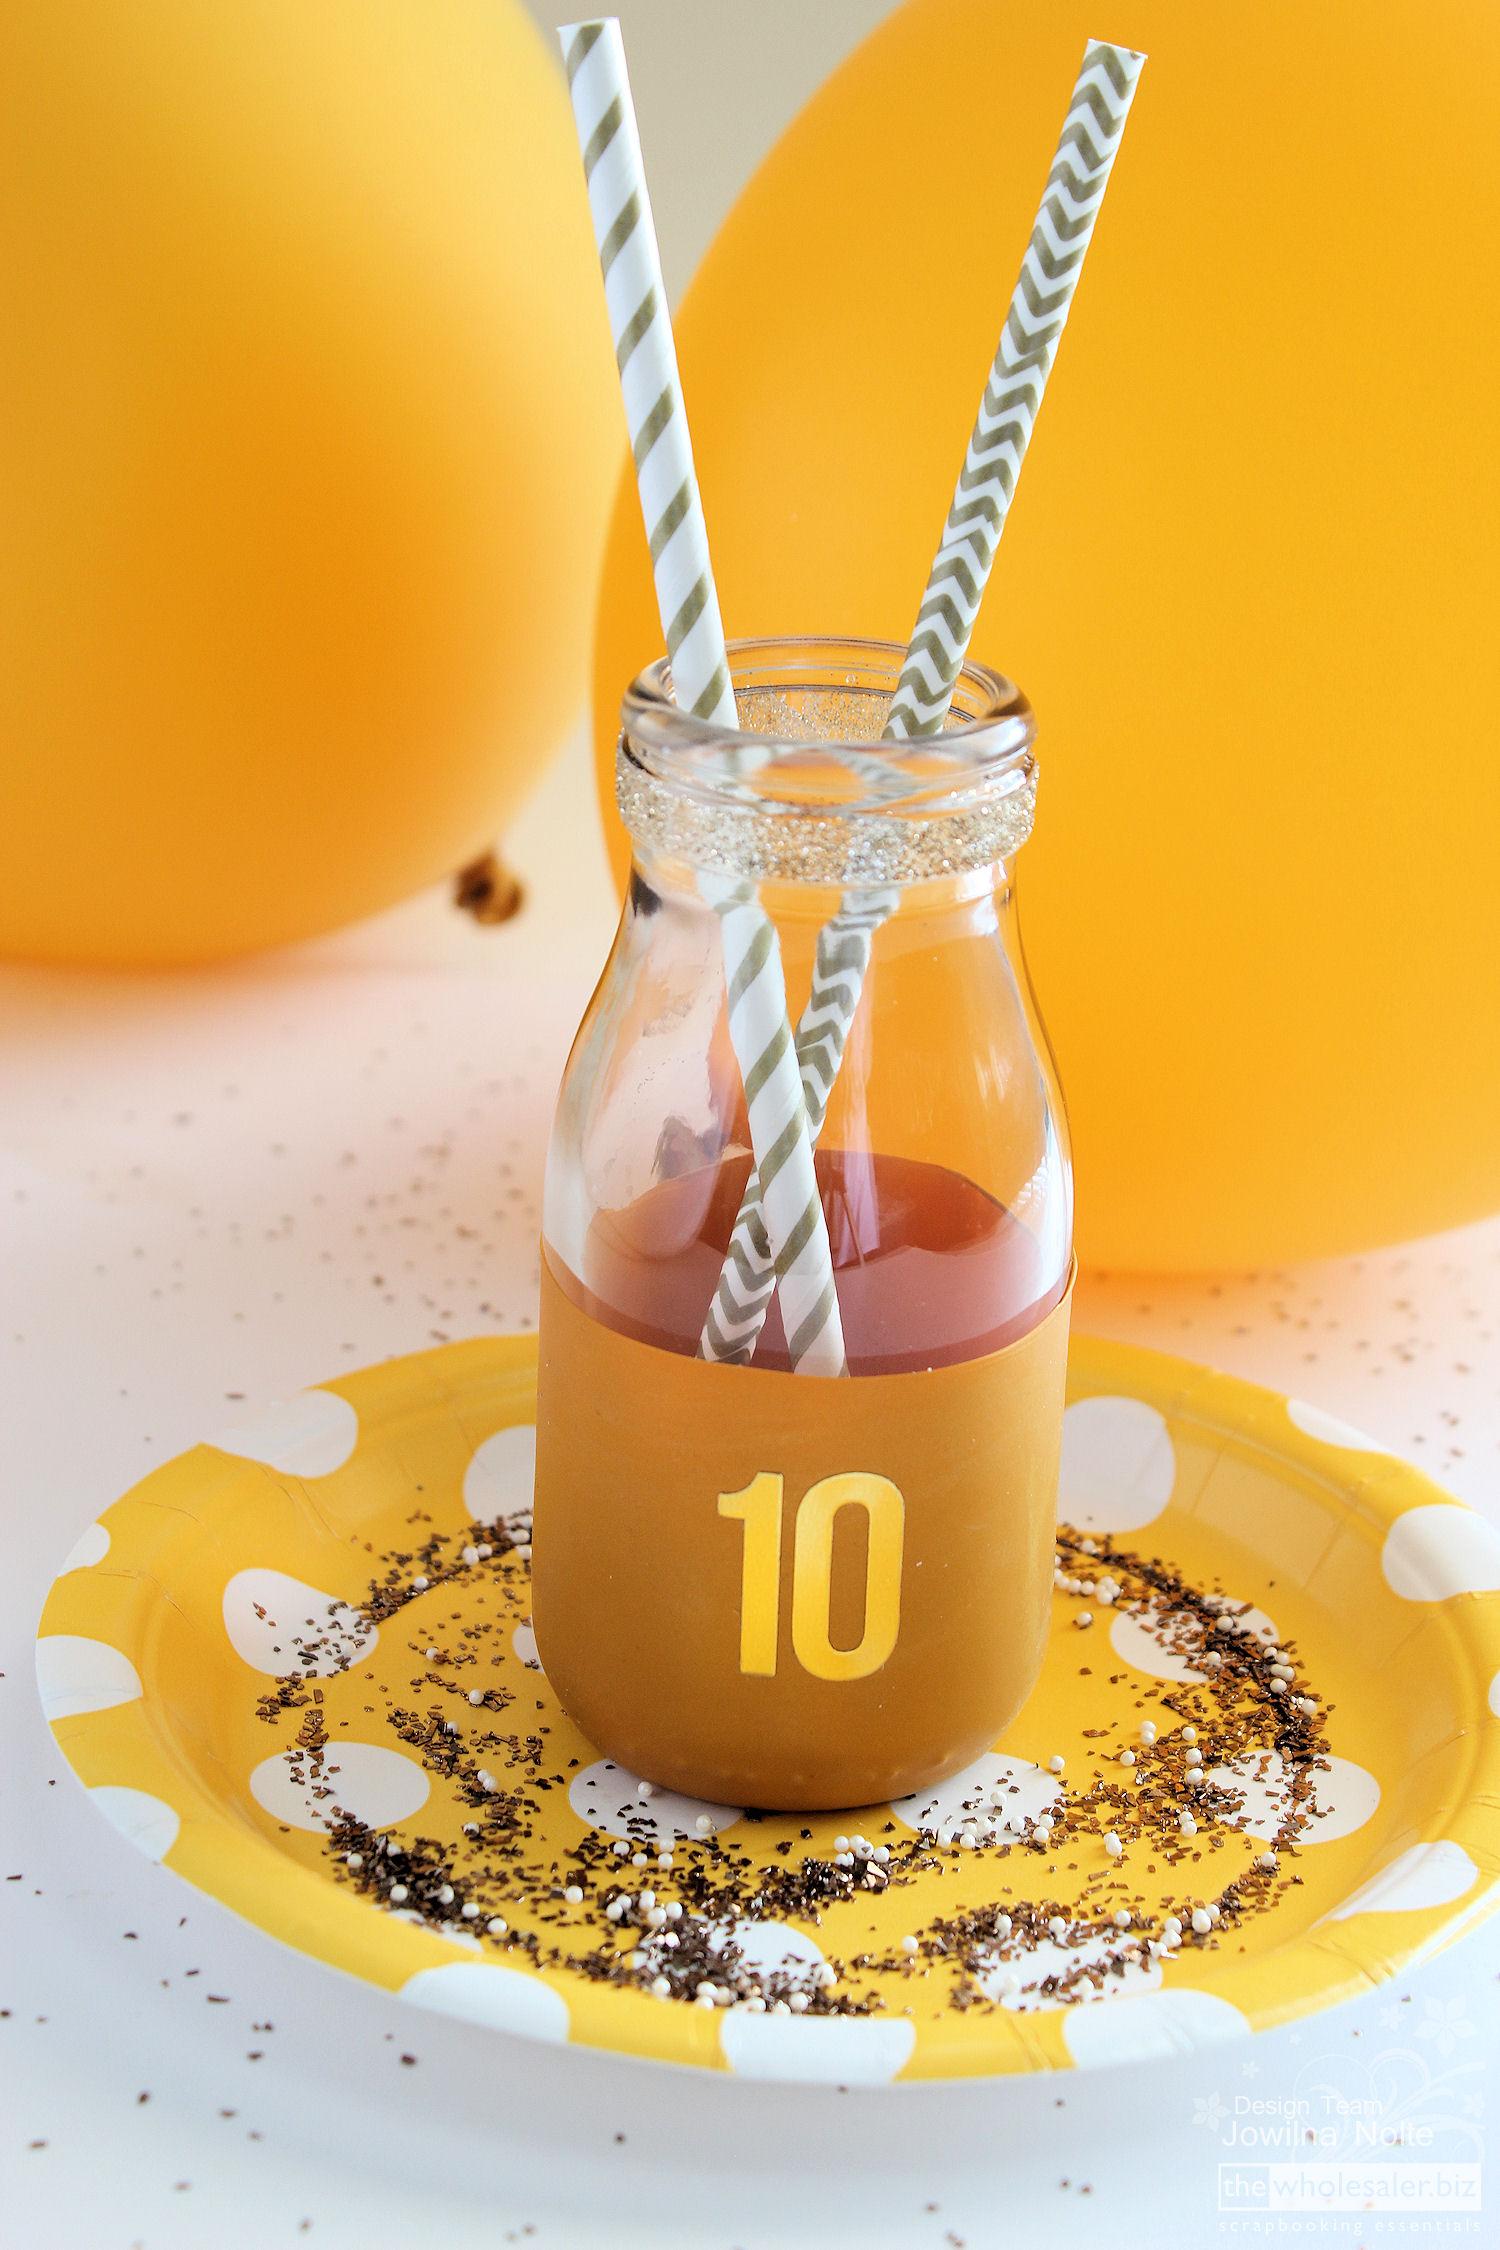 Golden Birthday Celebrations - DIY Bottle Idea